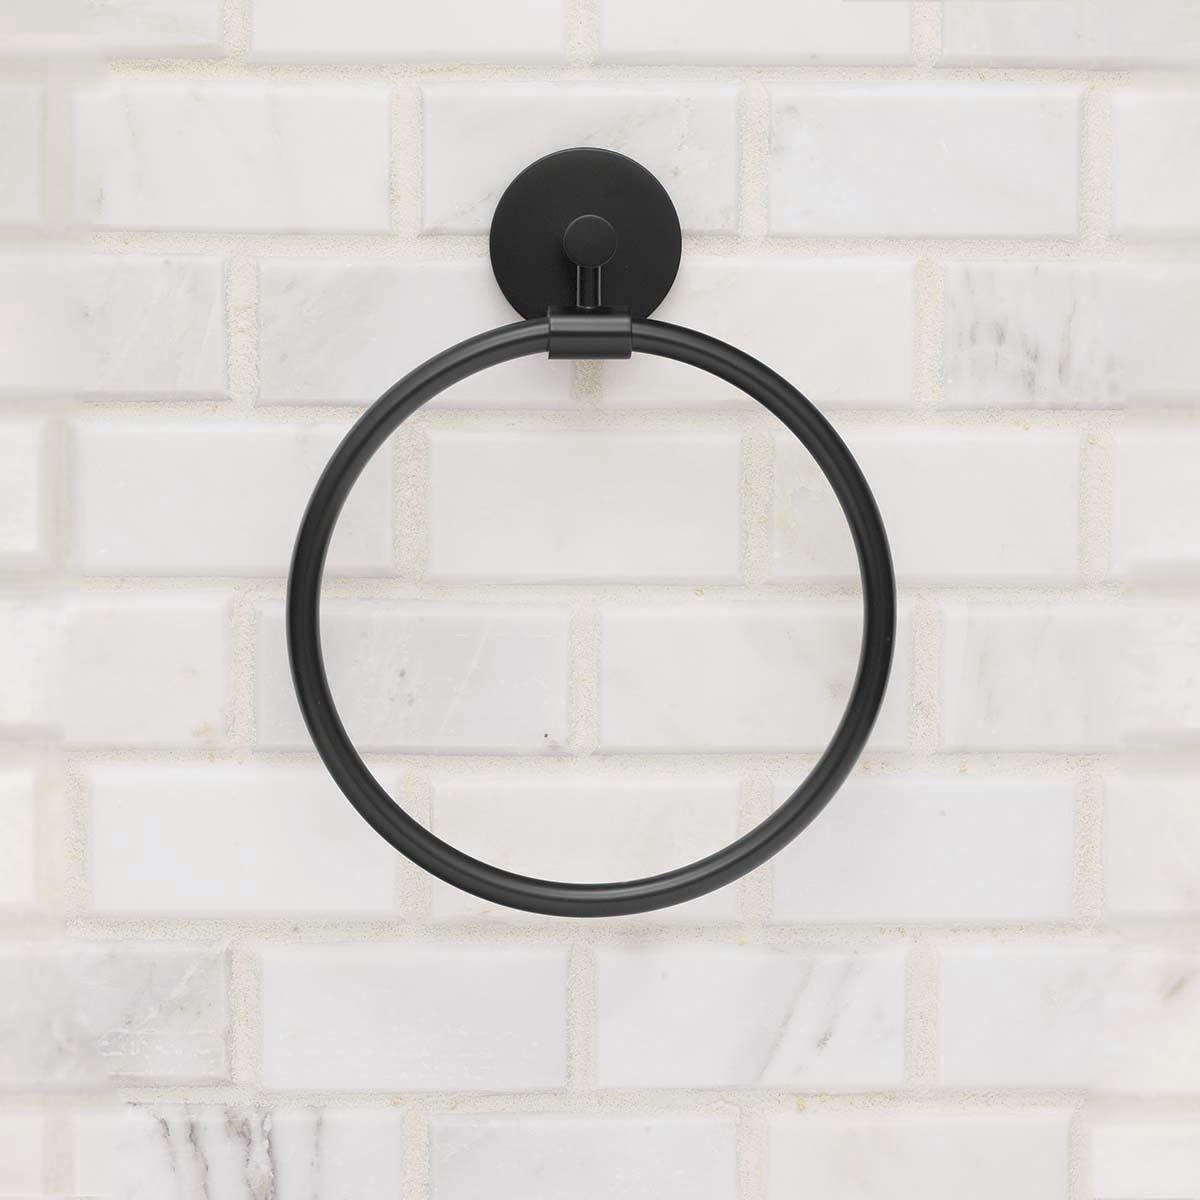 Speakman SA-2004-MB Neo Towel Ring, Matte Black by Speakman (Image #3)